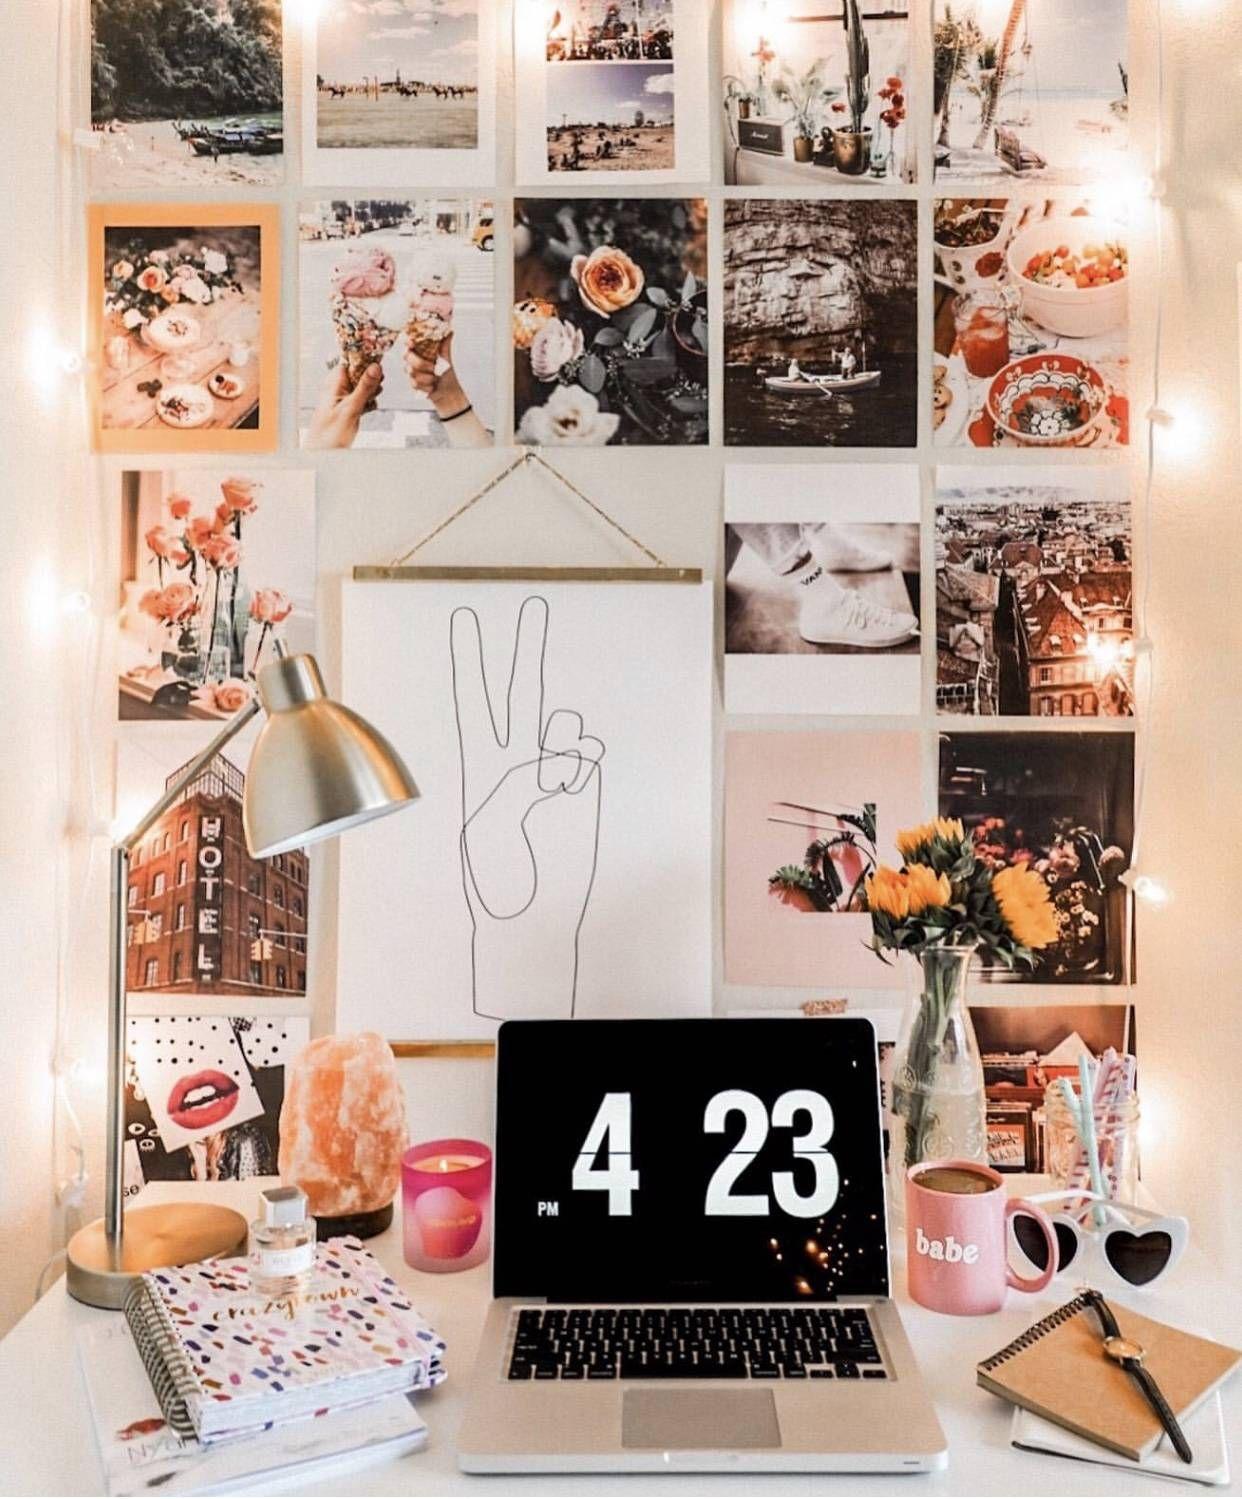 VSCO Room Ideas: How to Create a Cute Vsco Room #cutedormrooms